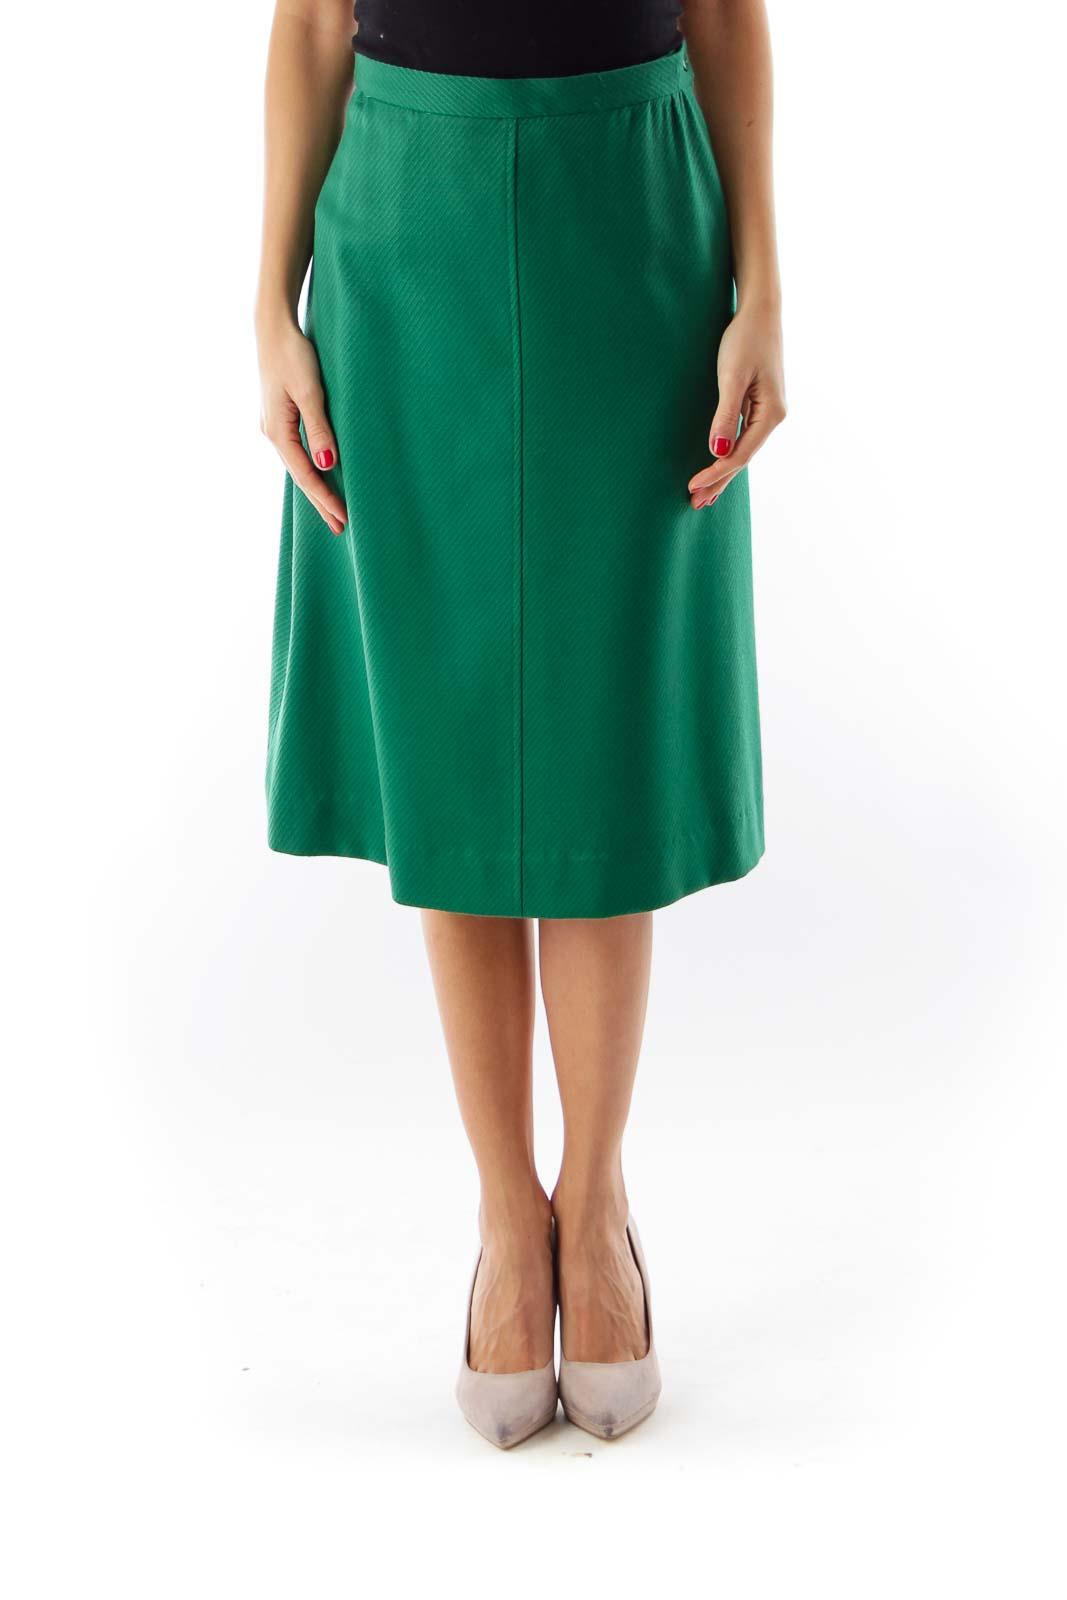 Green Pinstripe Midi Skirt Front